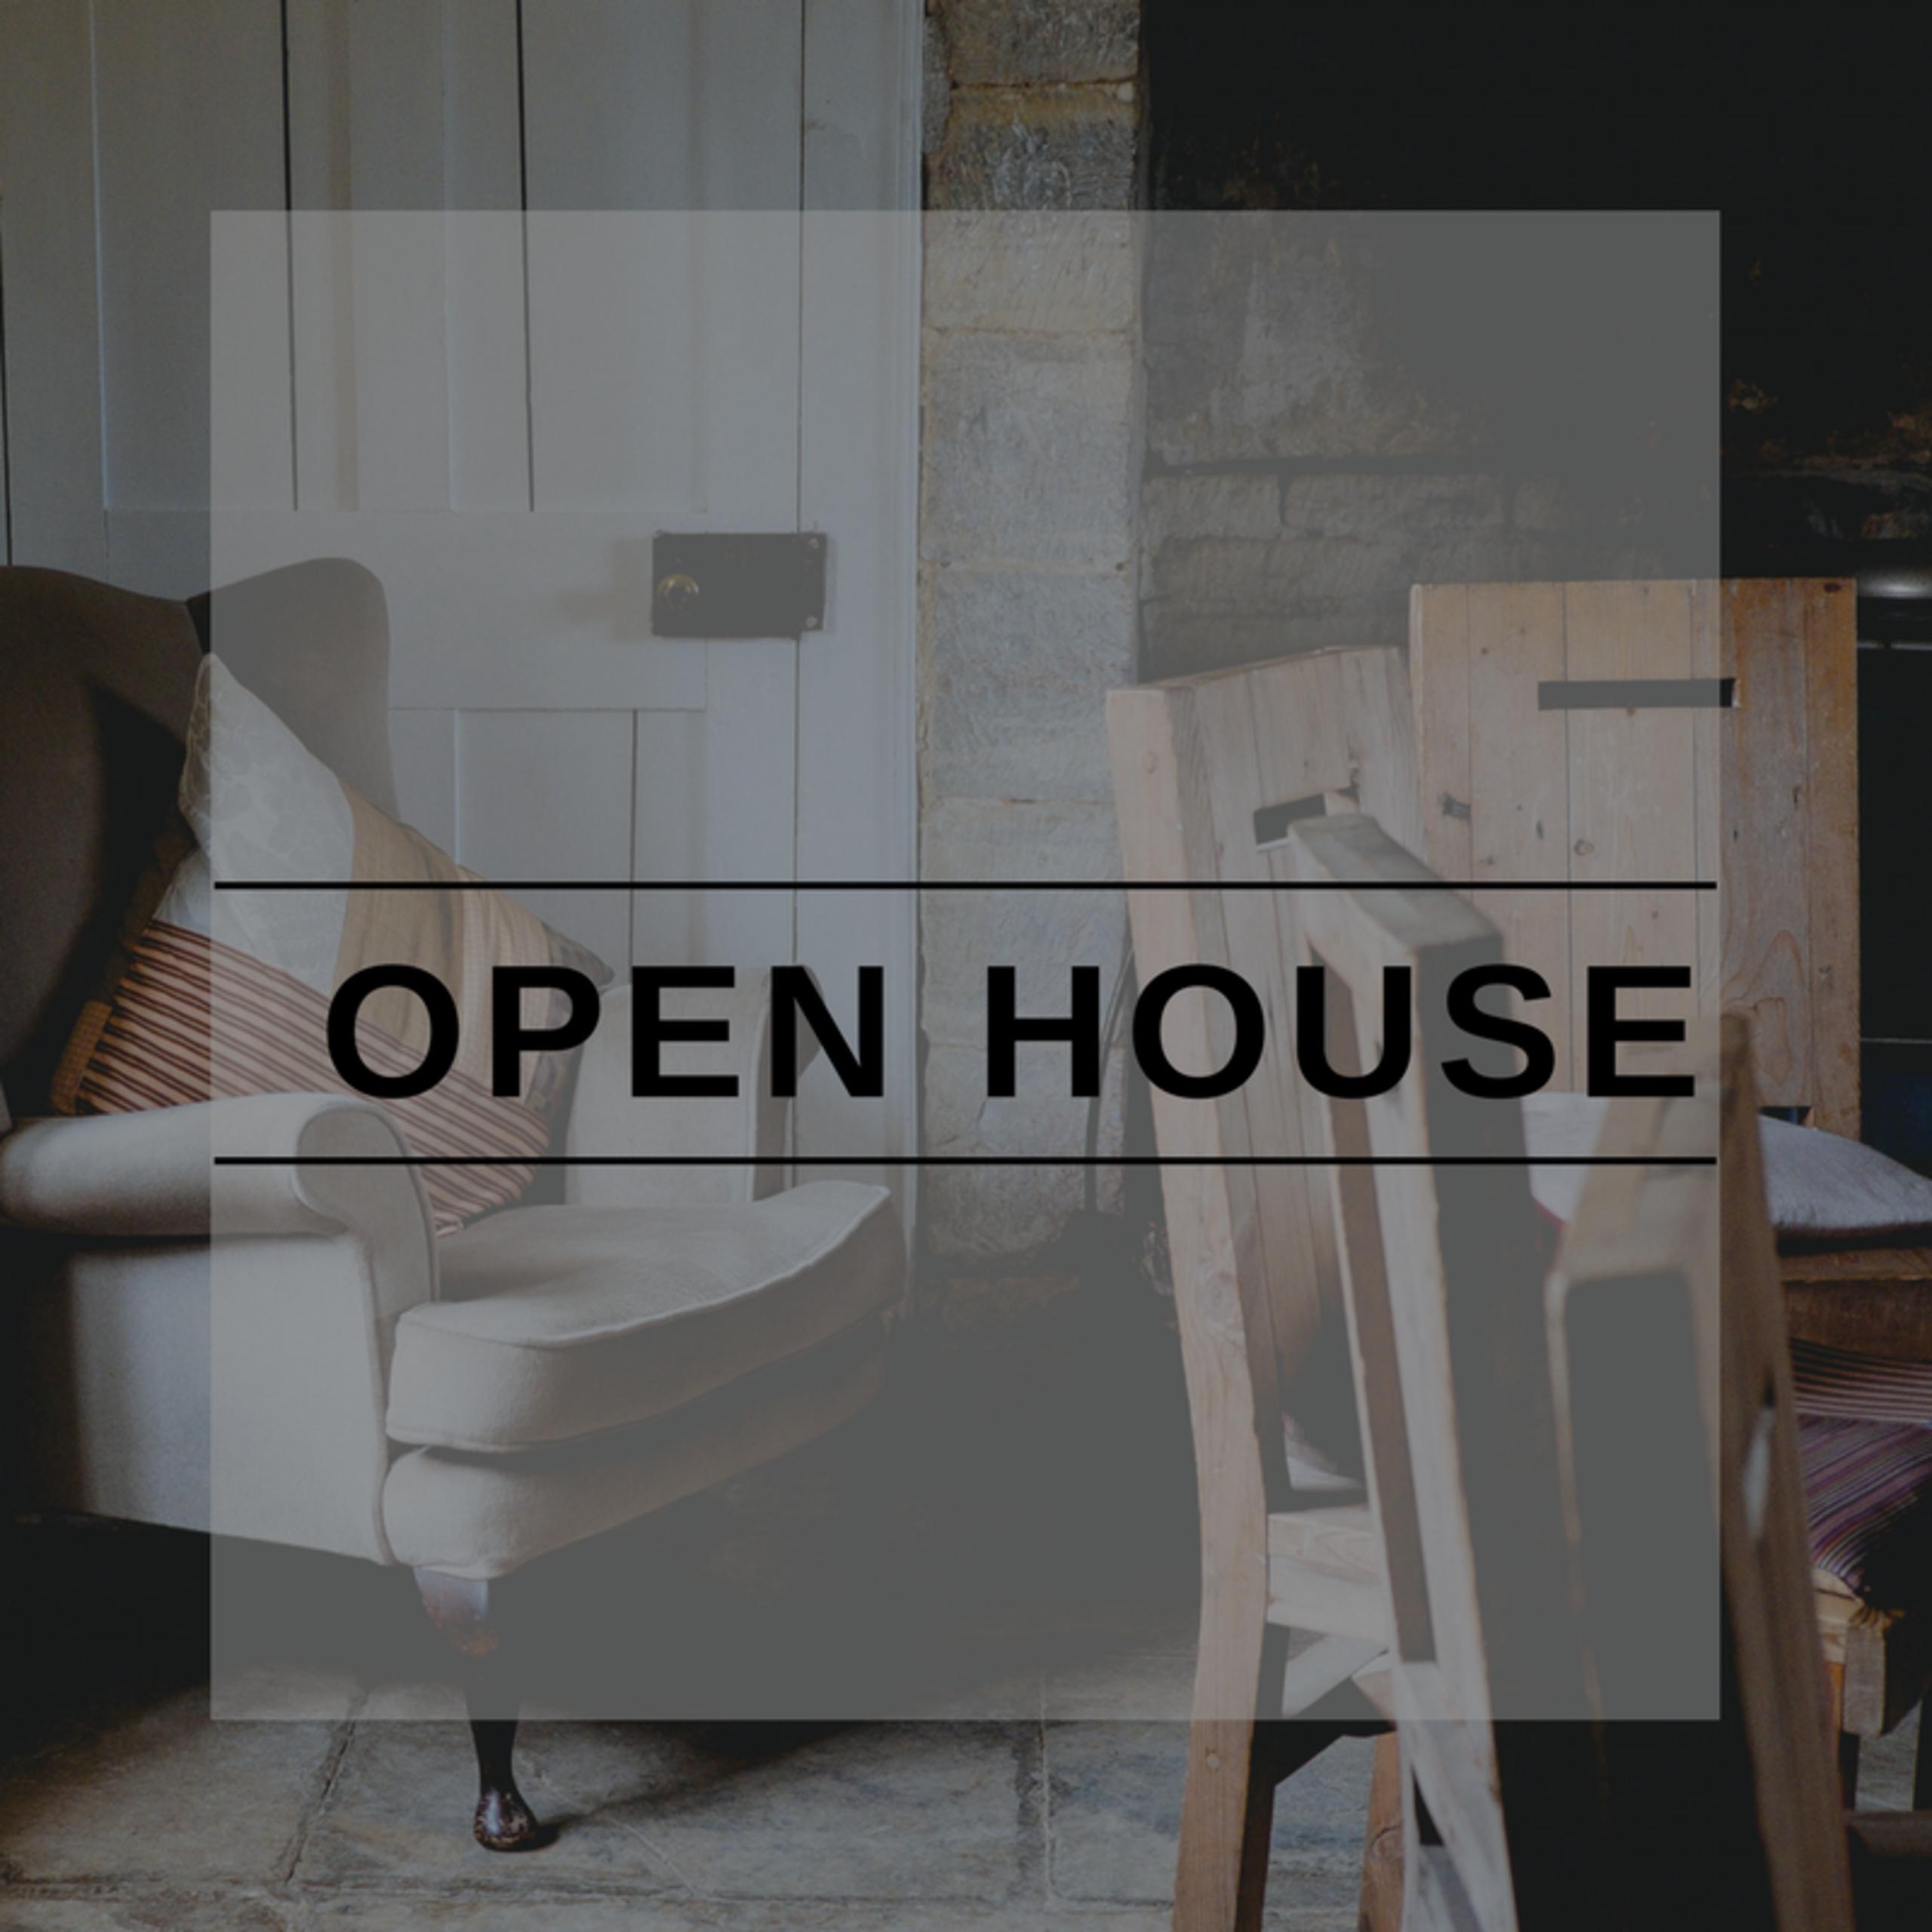 OPEN HOUSE LIST 2/10/18 – 2/11/18